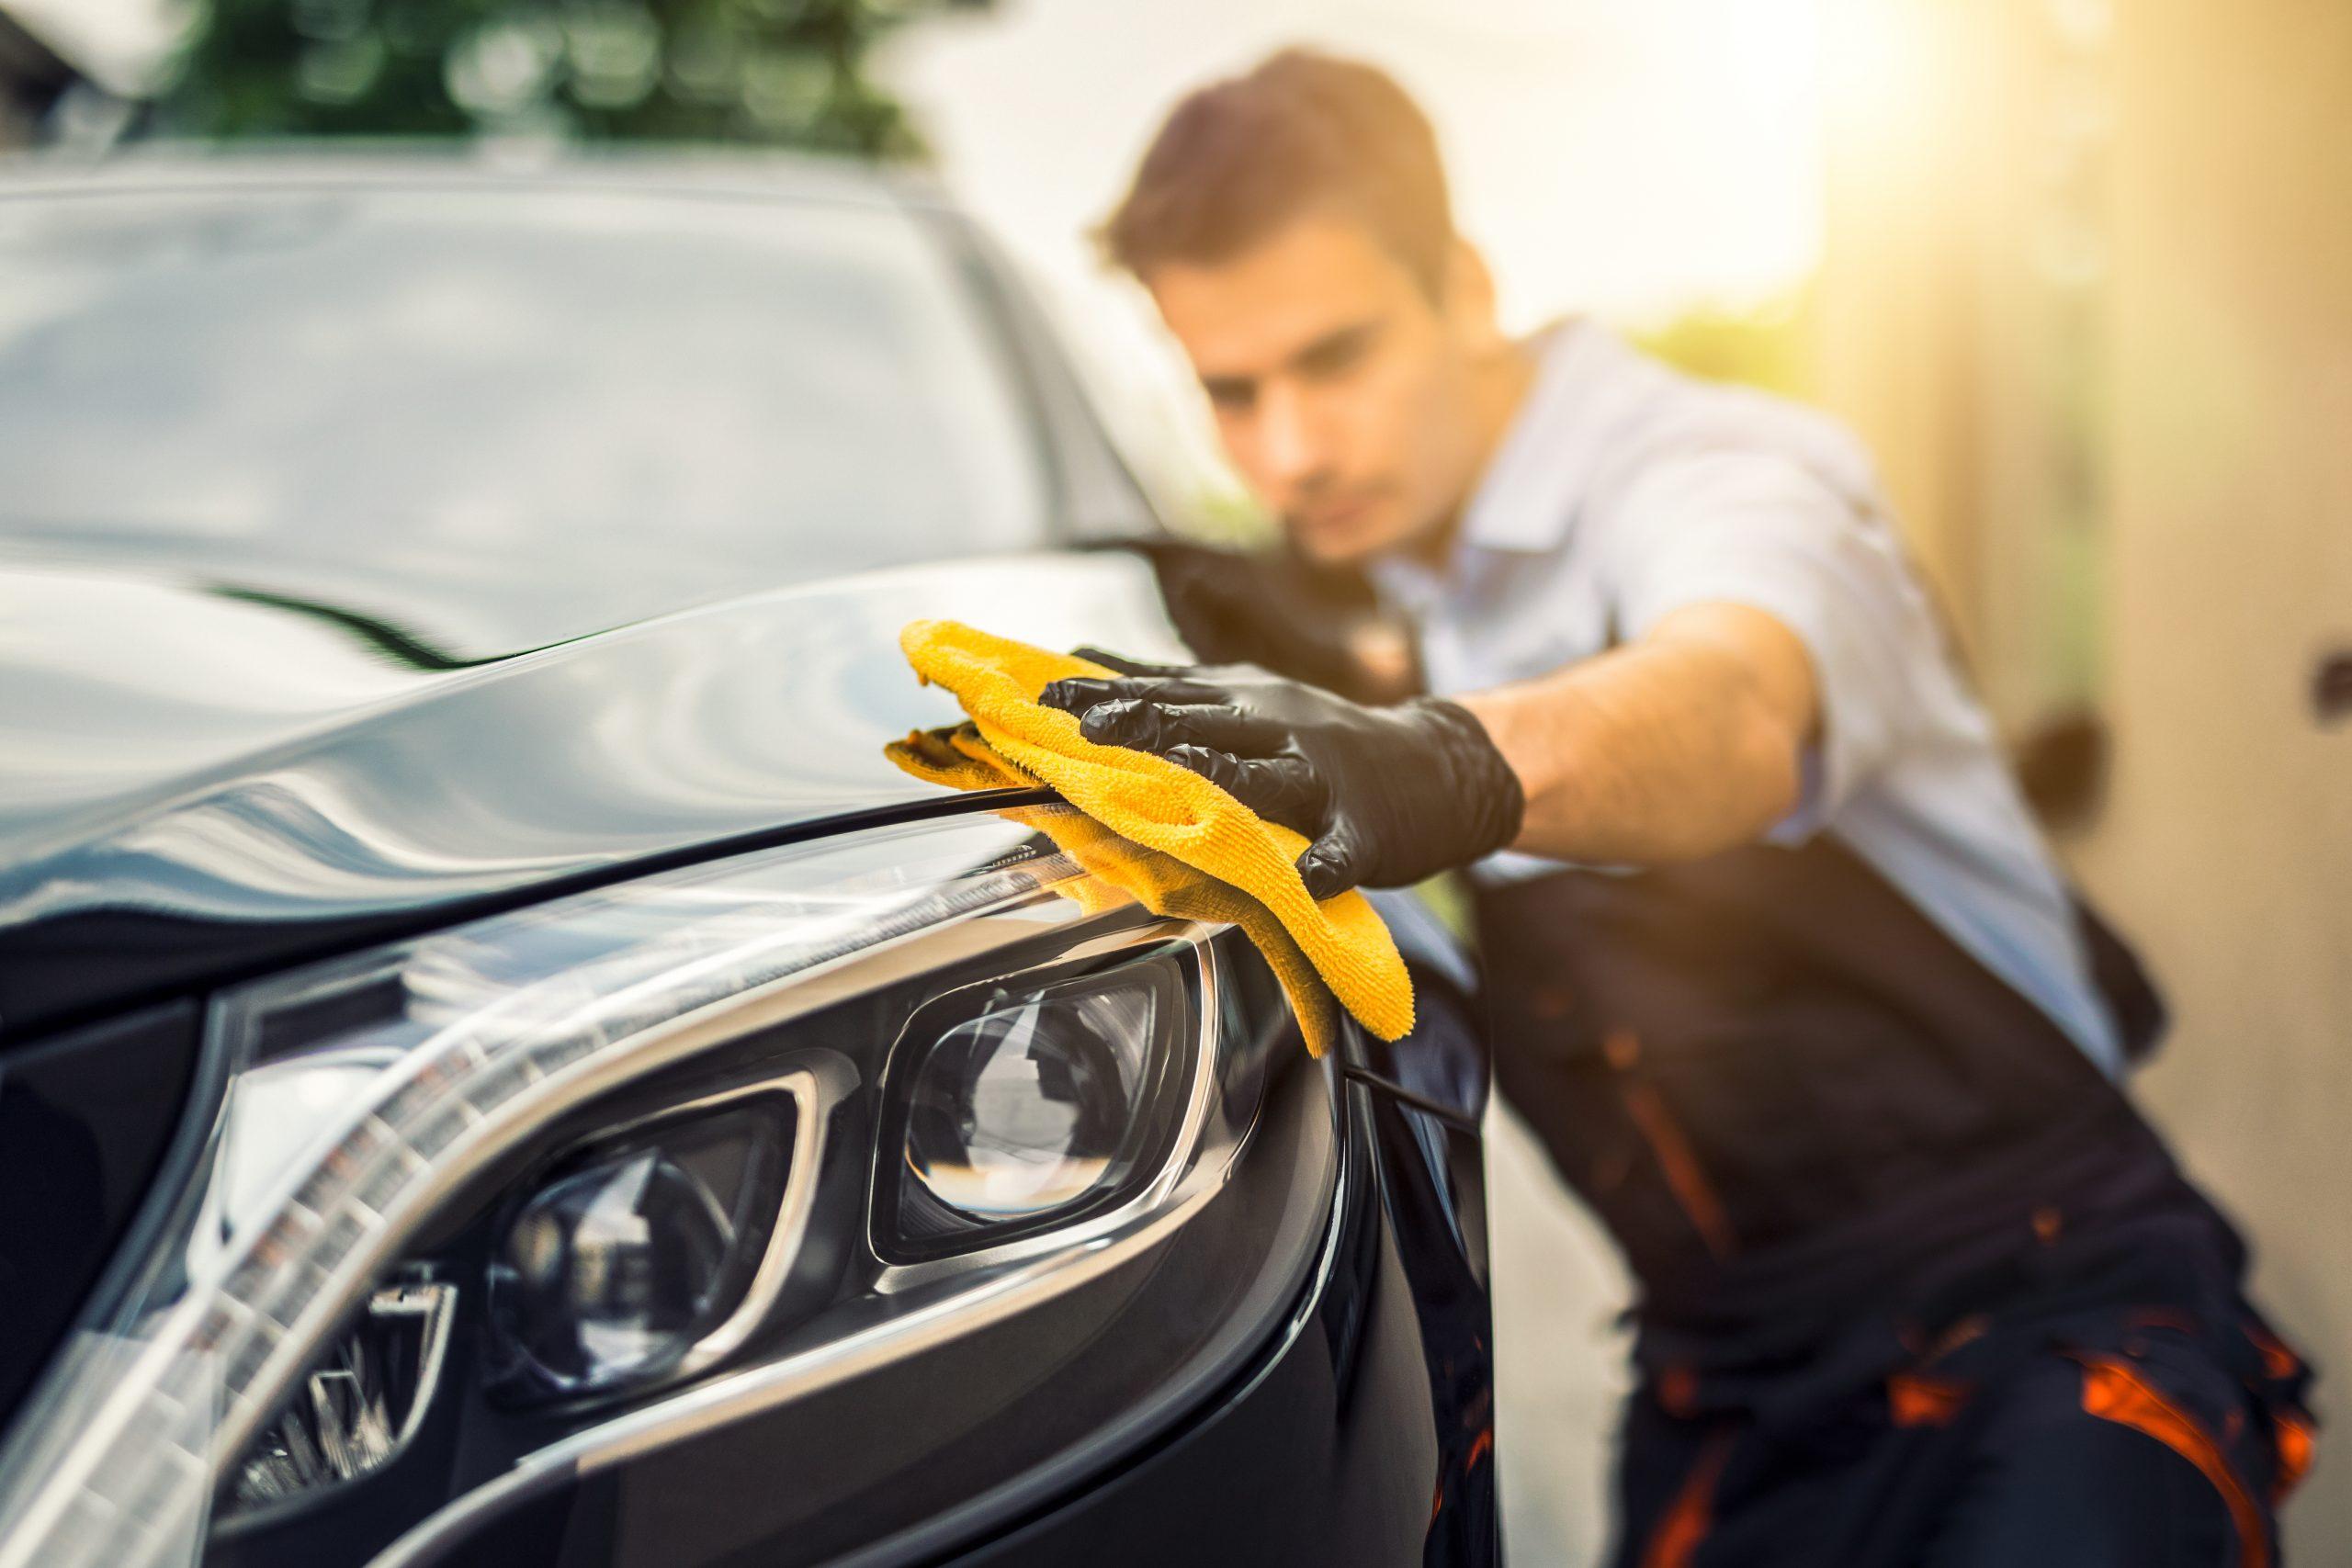 Auto polieren - Anleitung & Tipps